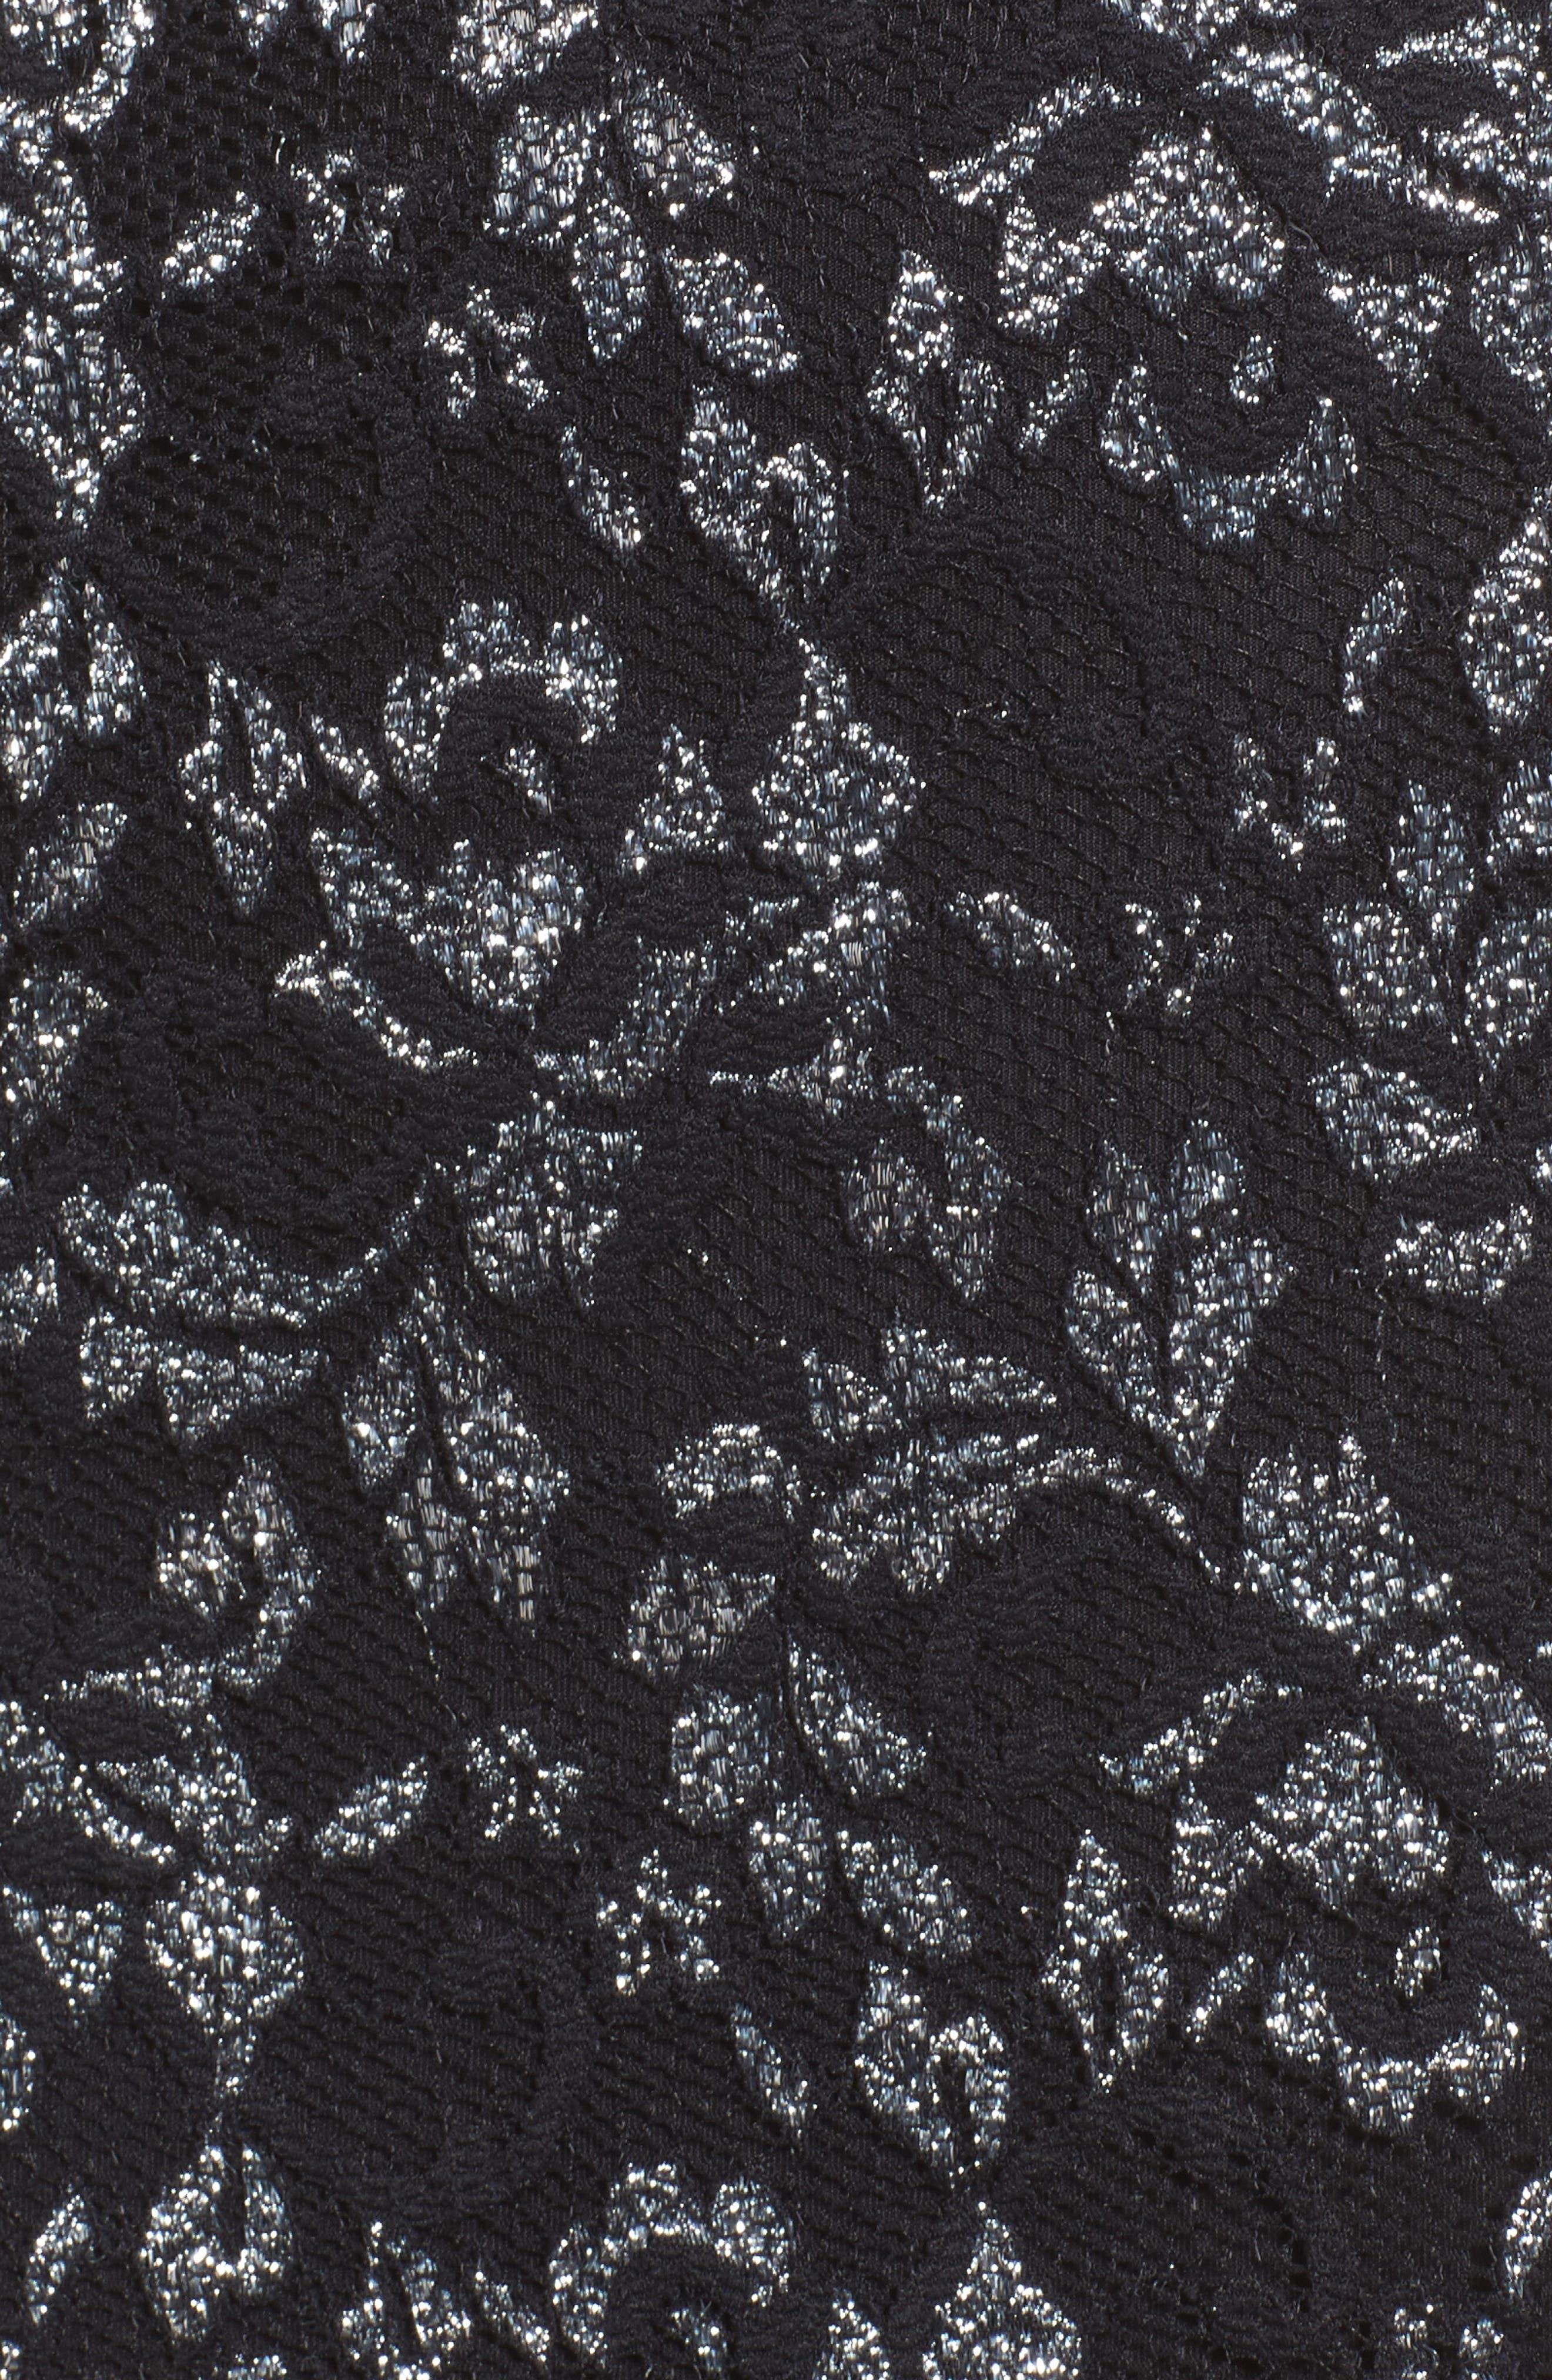 Sitabella Lace Dress,                             Alternate thumbnail 5, color,